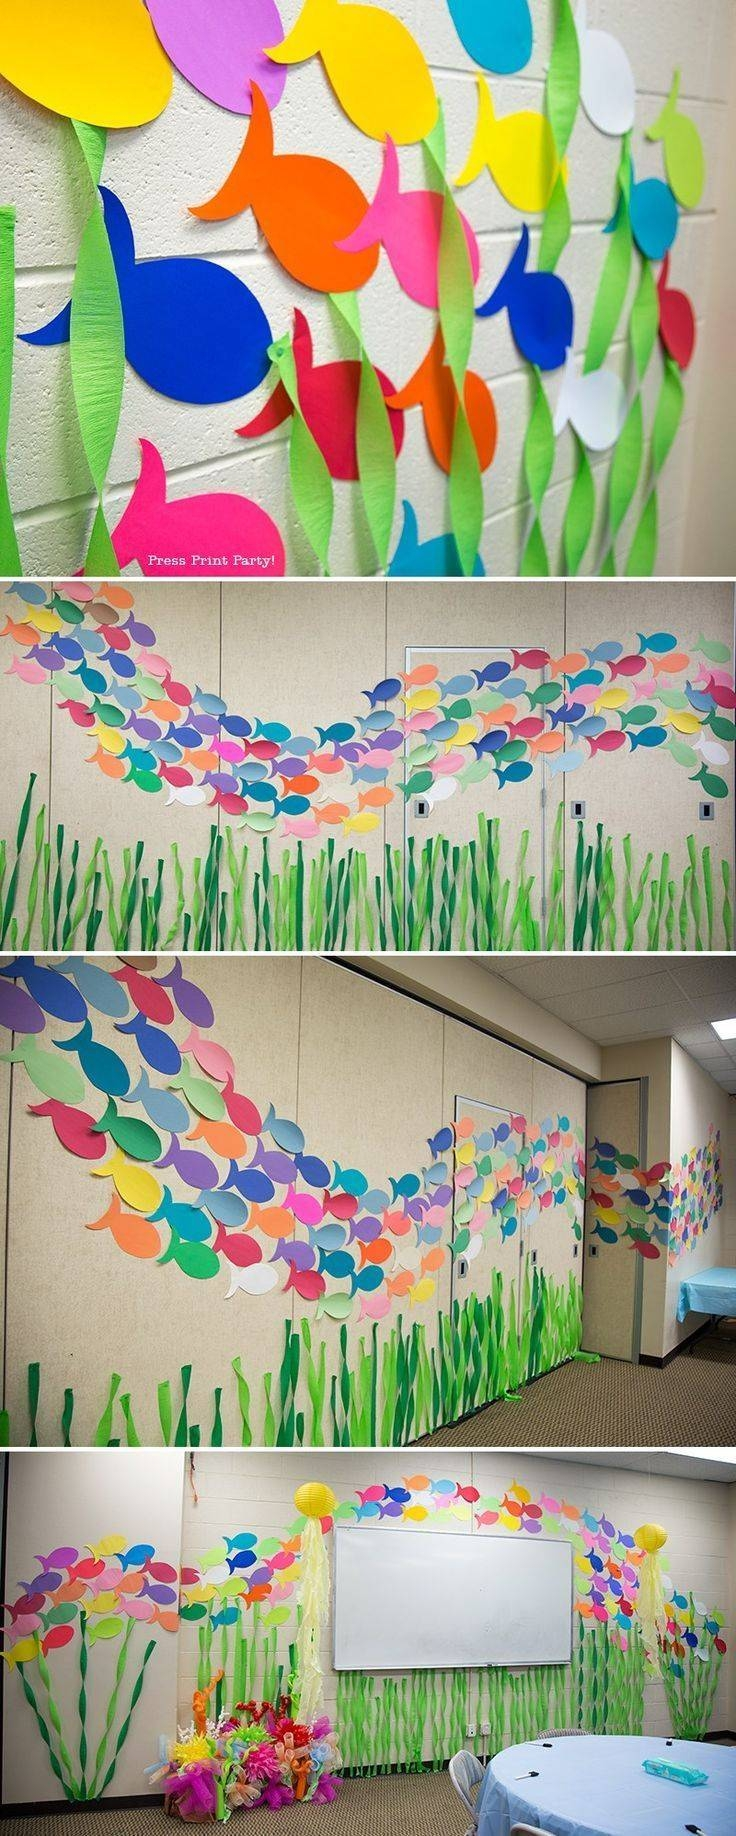 Best 25+ Preschool Classroom Decor Ideas On Pinterest   Preschool Pertaining To Recent Preschool Wall Decoration (View 2 of 30)